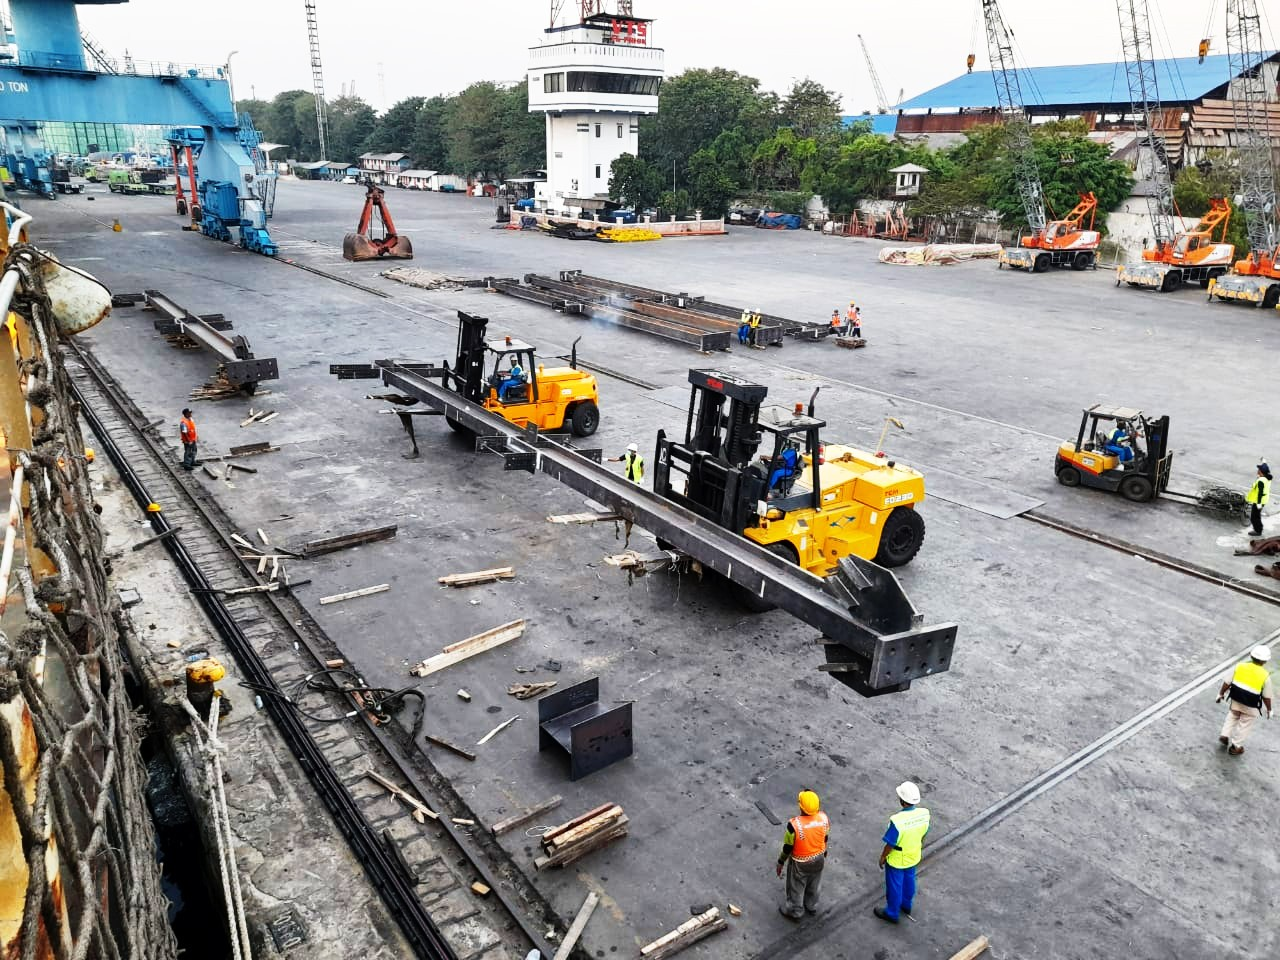 Kegiatan Export Perdana Steel Structures TG. PRIOK, Jakarta to Vancouver, Canada